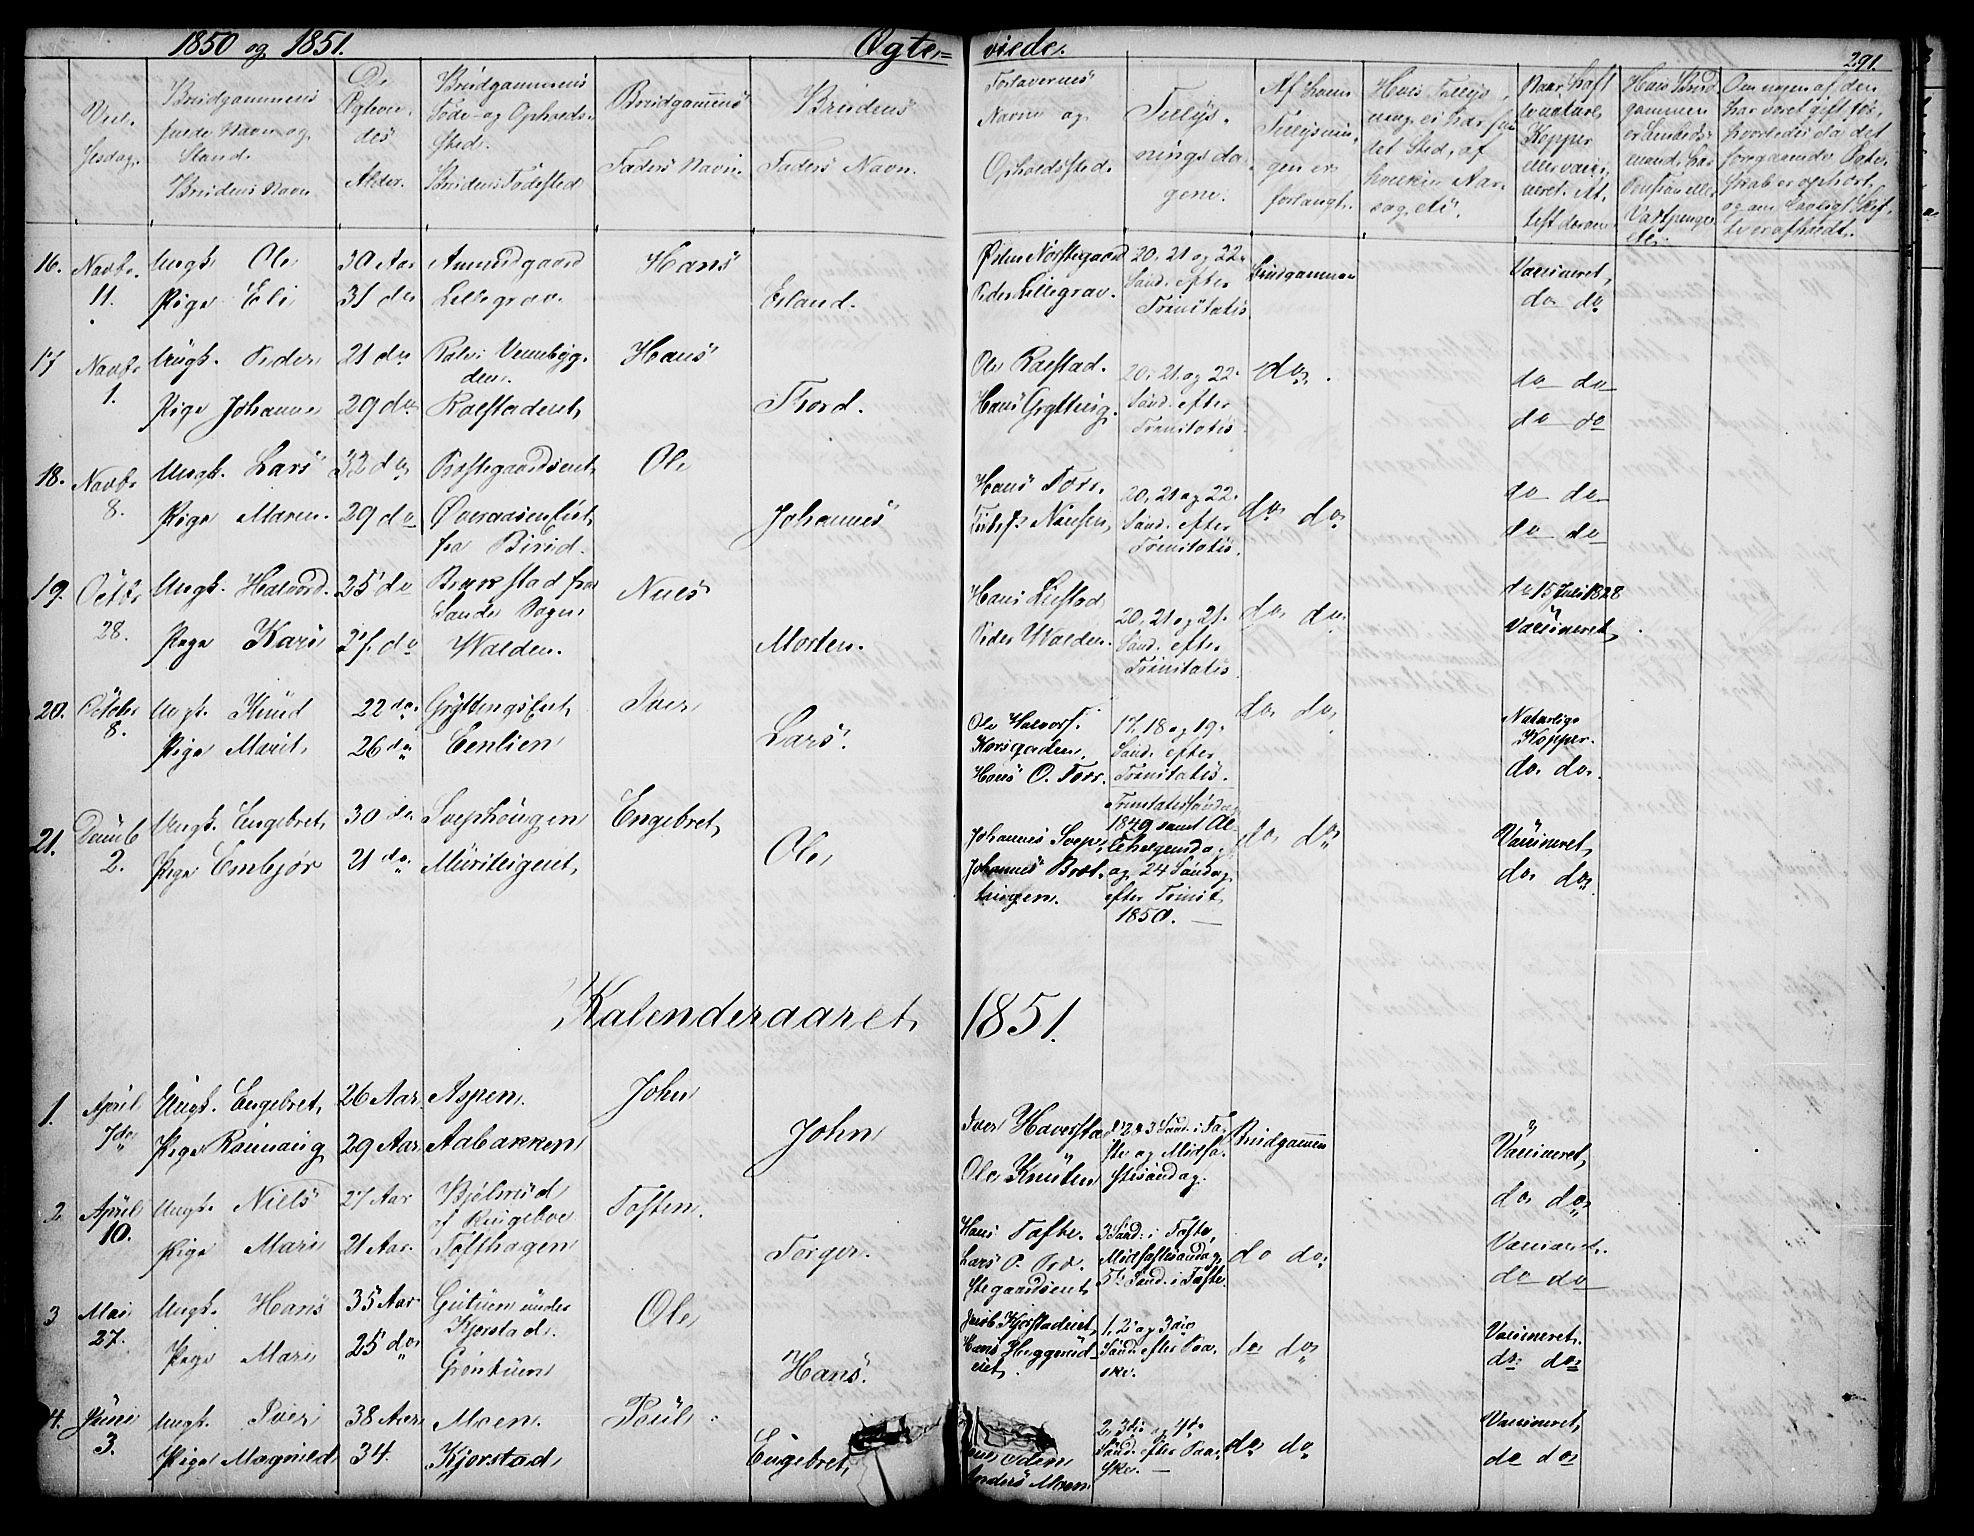 SAH, Sør-Fron prestekontor, H/Ha/Hab/L0001: Klokkerbok nr. 1, 1844-1863, s. 291